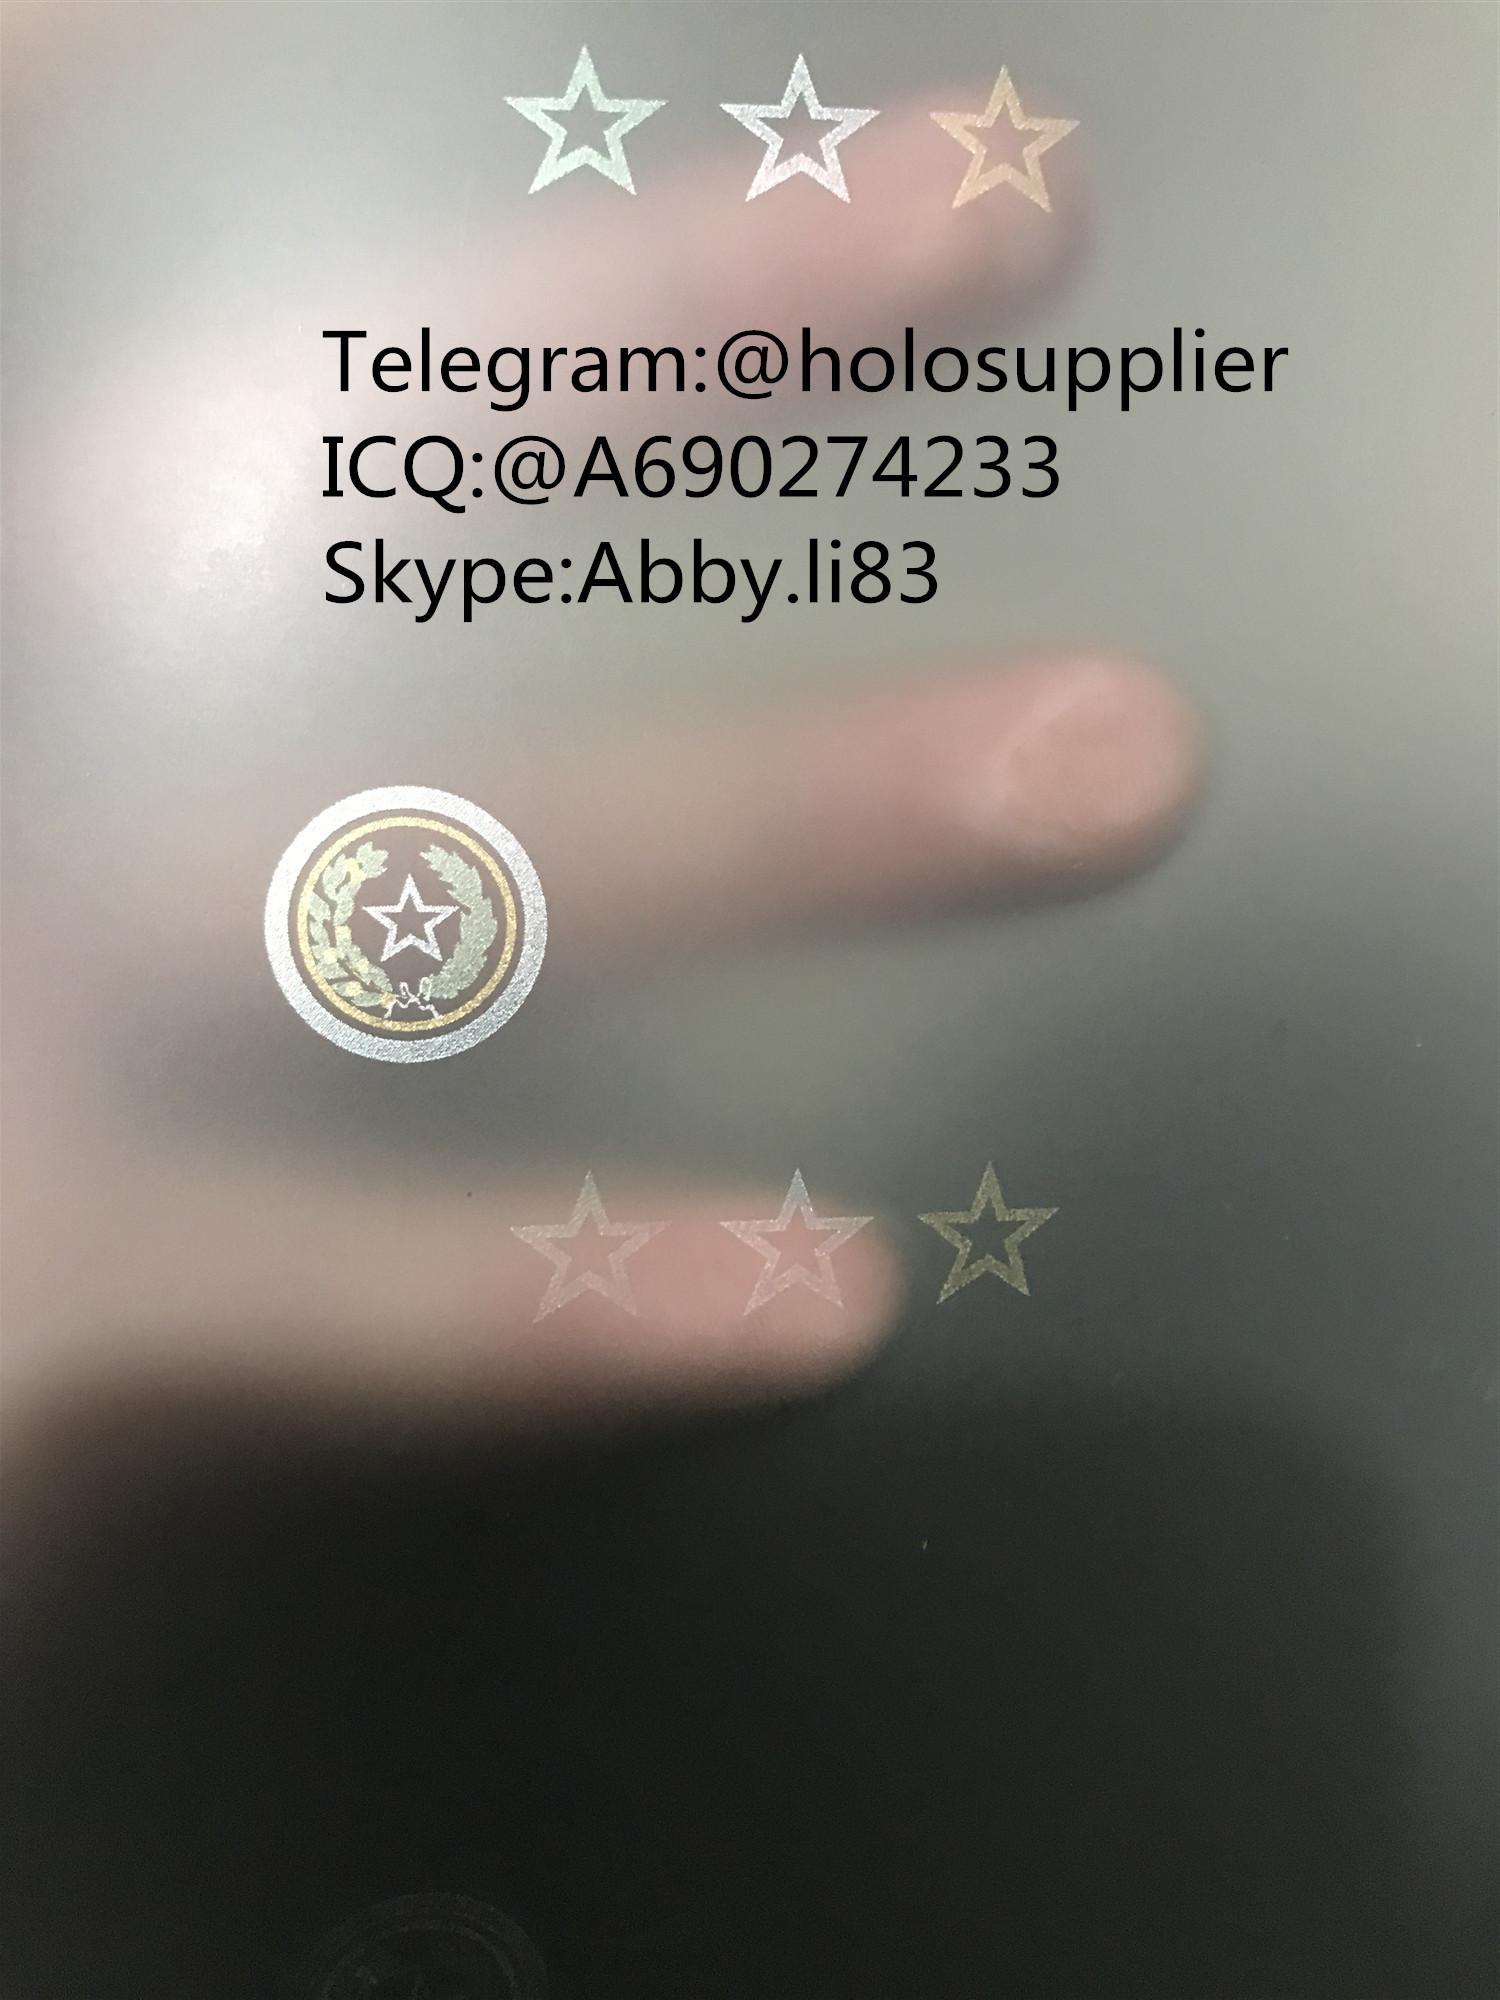 New Texas OVI sheet hologram